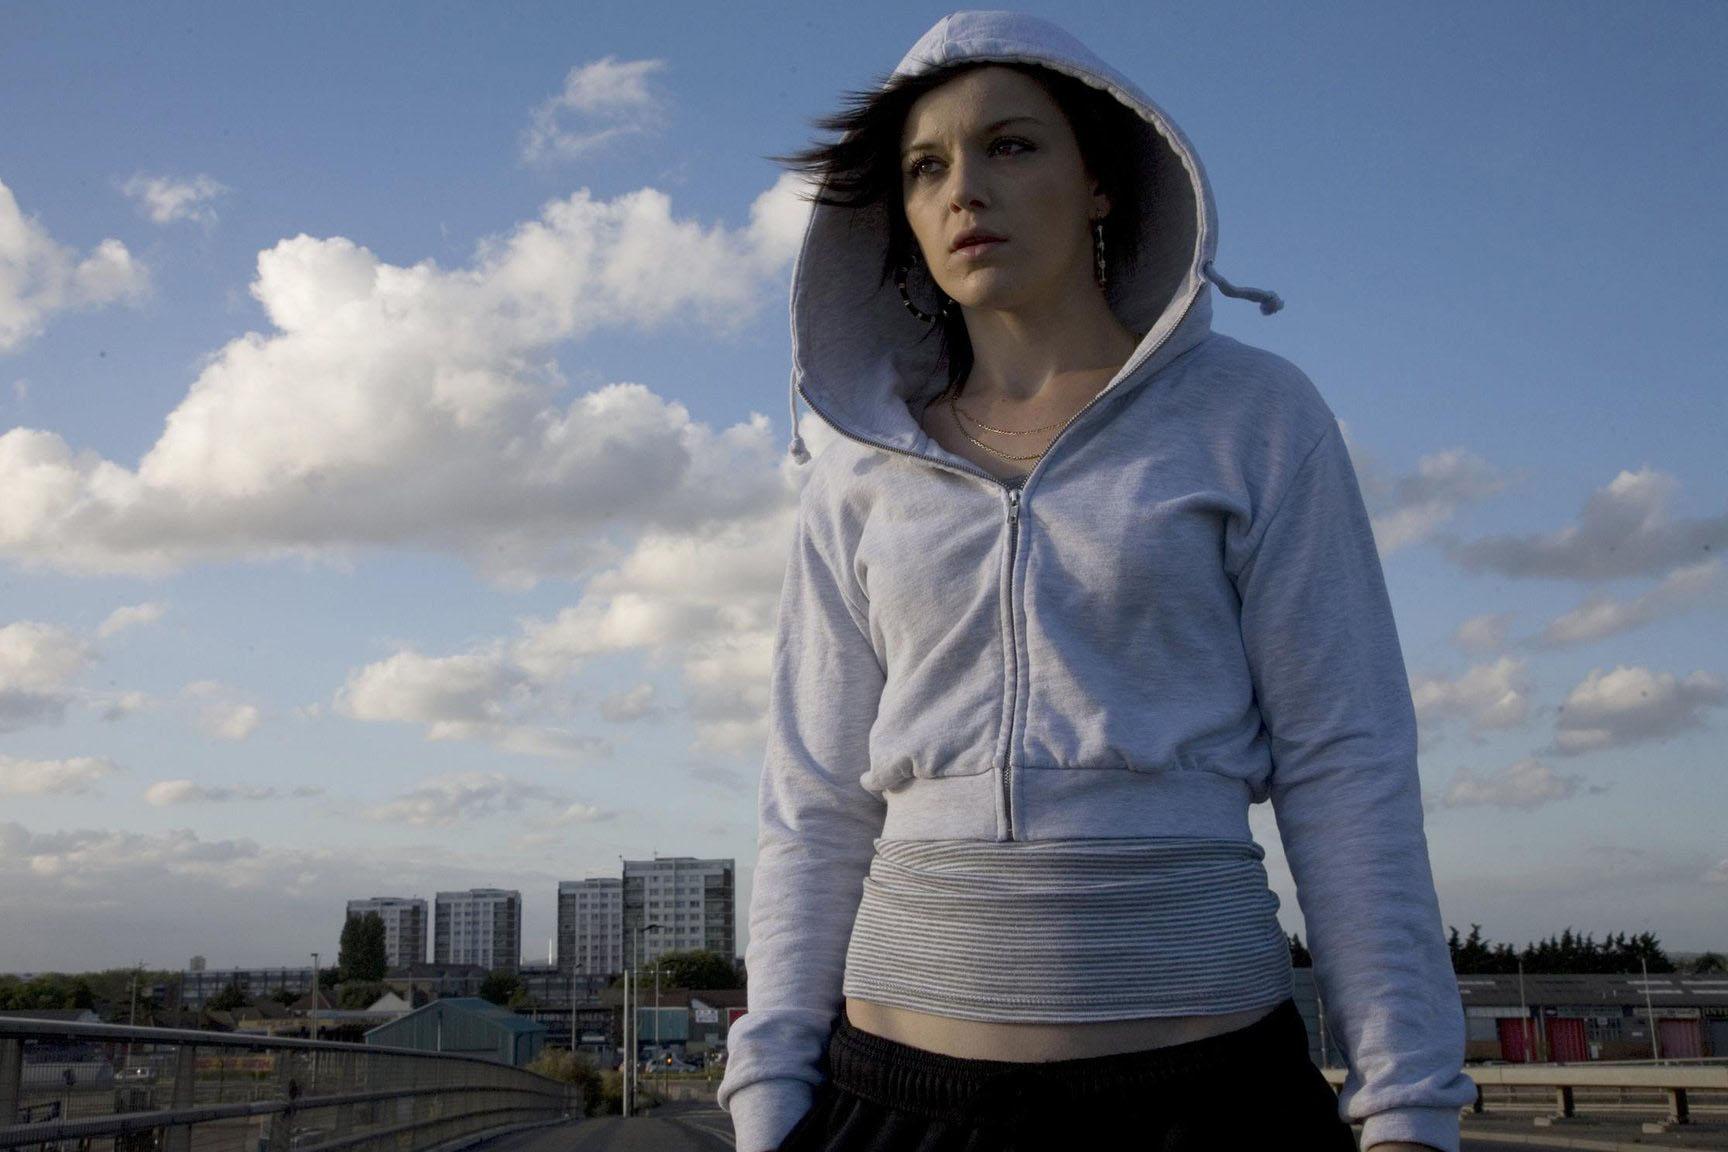 英國女性導演 Andrea Arnold 2009年電影《90後·少女·性起義》(Fish Tank)的劇照。